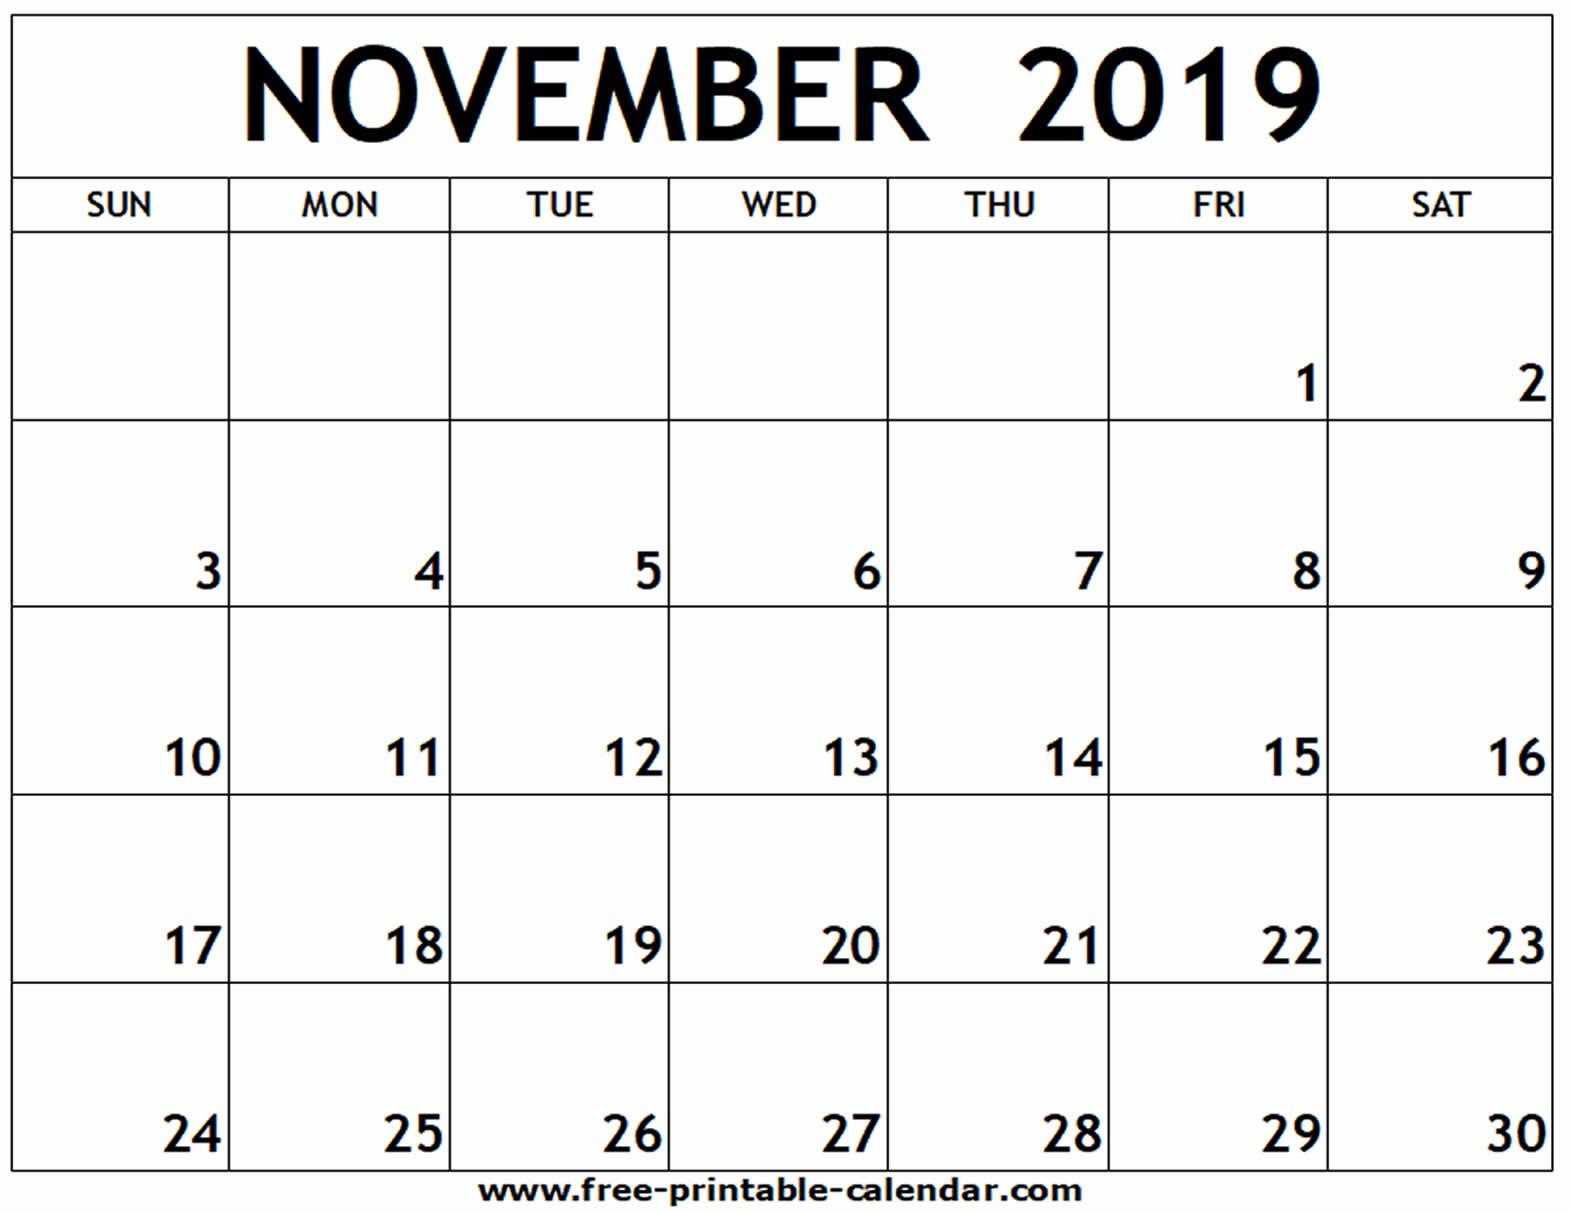 November 2019 Printable Calendar Free printable calendar